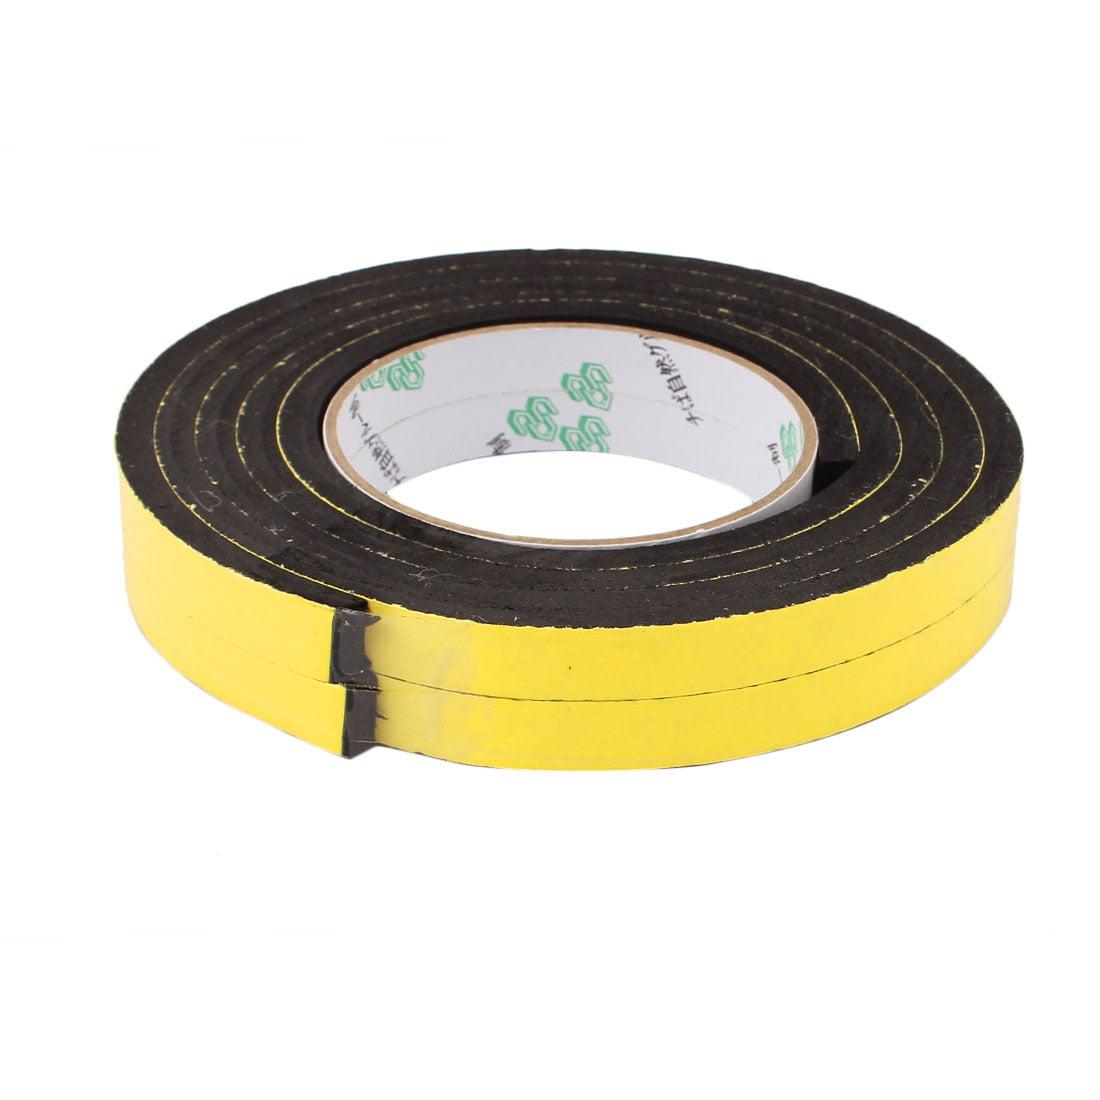 2 Pcs 12 x 6mm Single Sided Self Adhesive Shockproof Sponge Foam Tape 2M Length